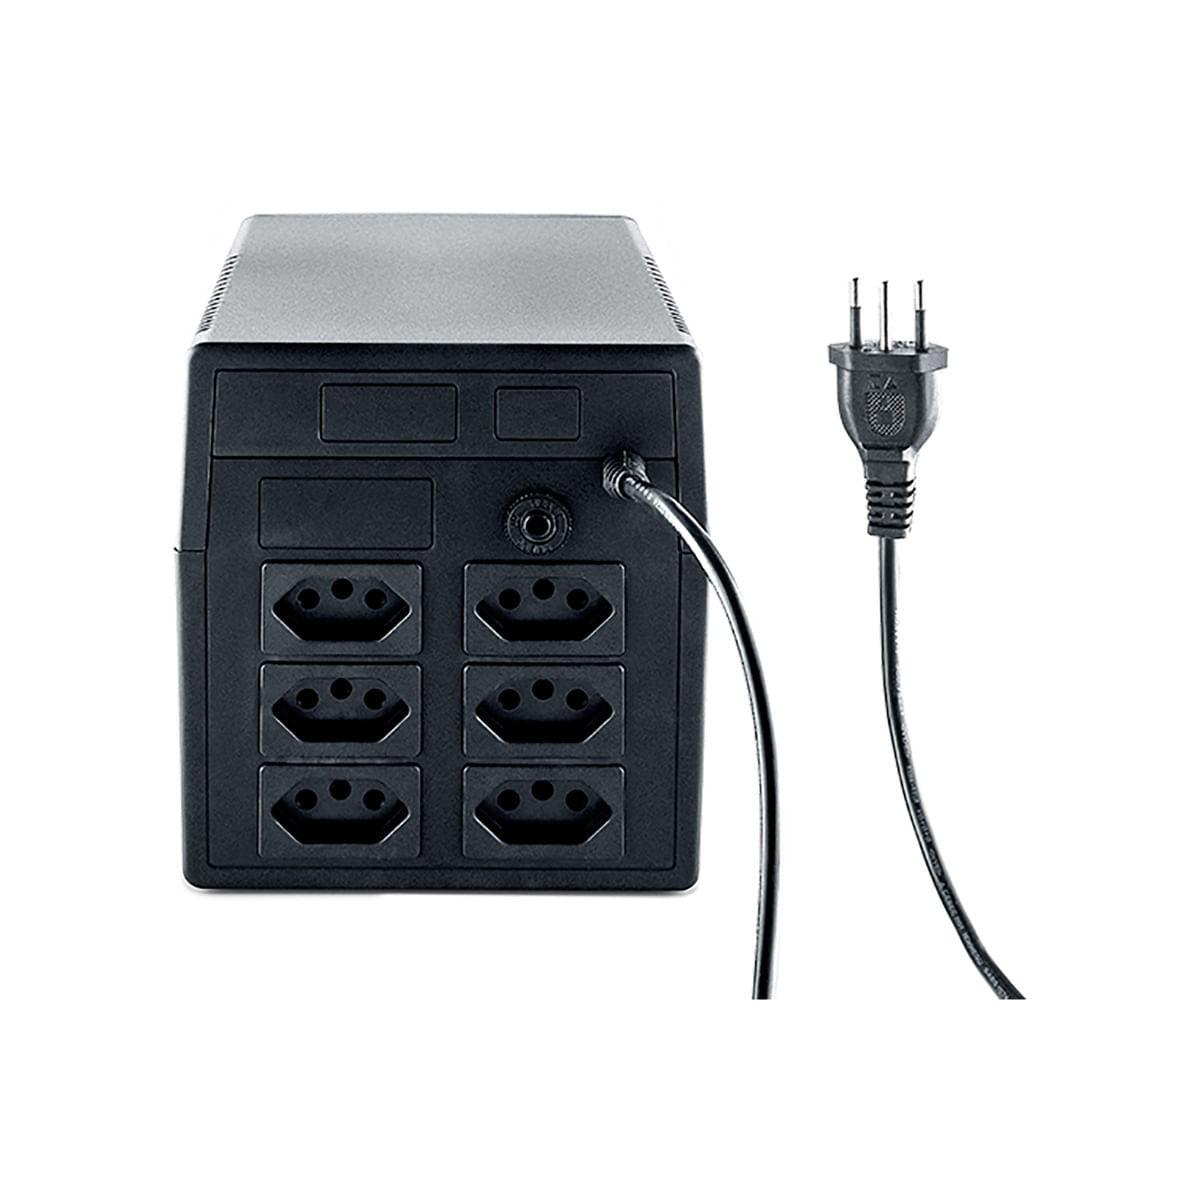 Nobreak Interativo Monovolt Intelbras XNB 1200Va 220V